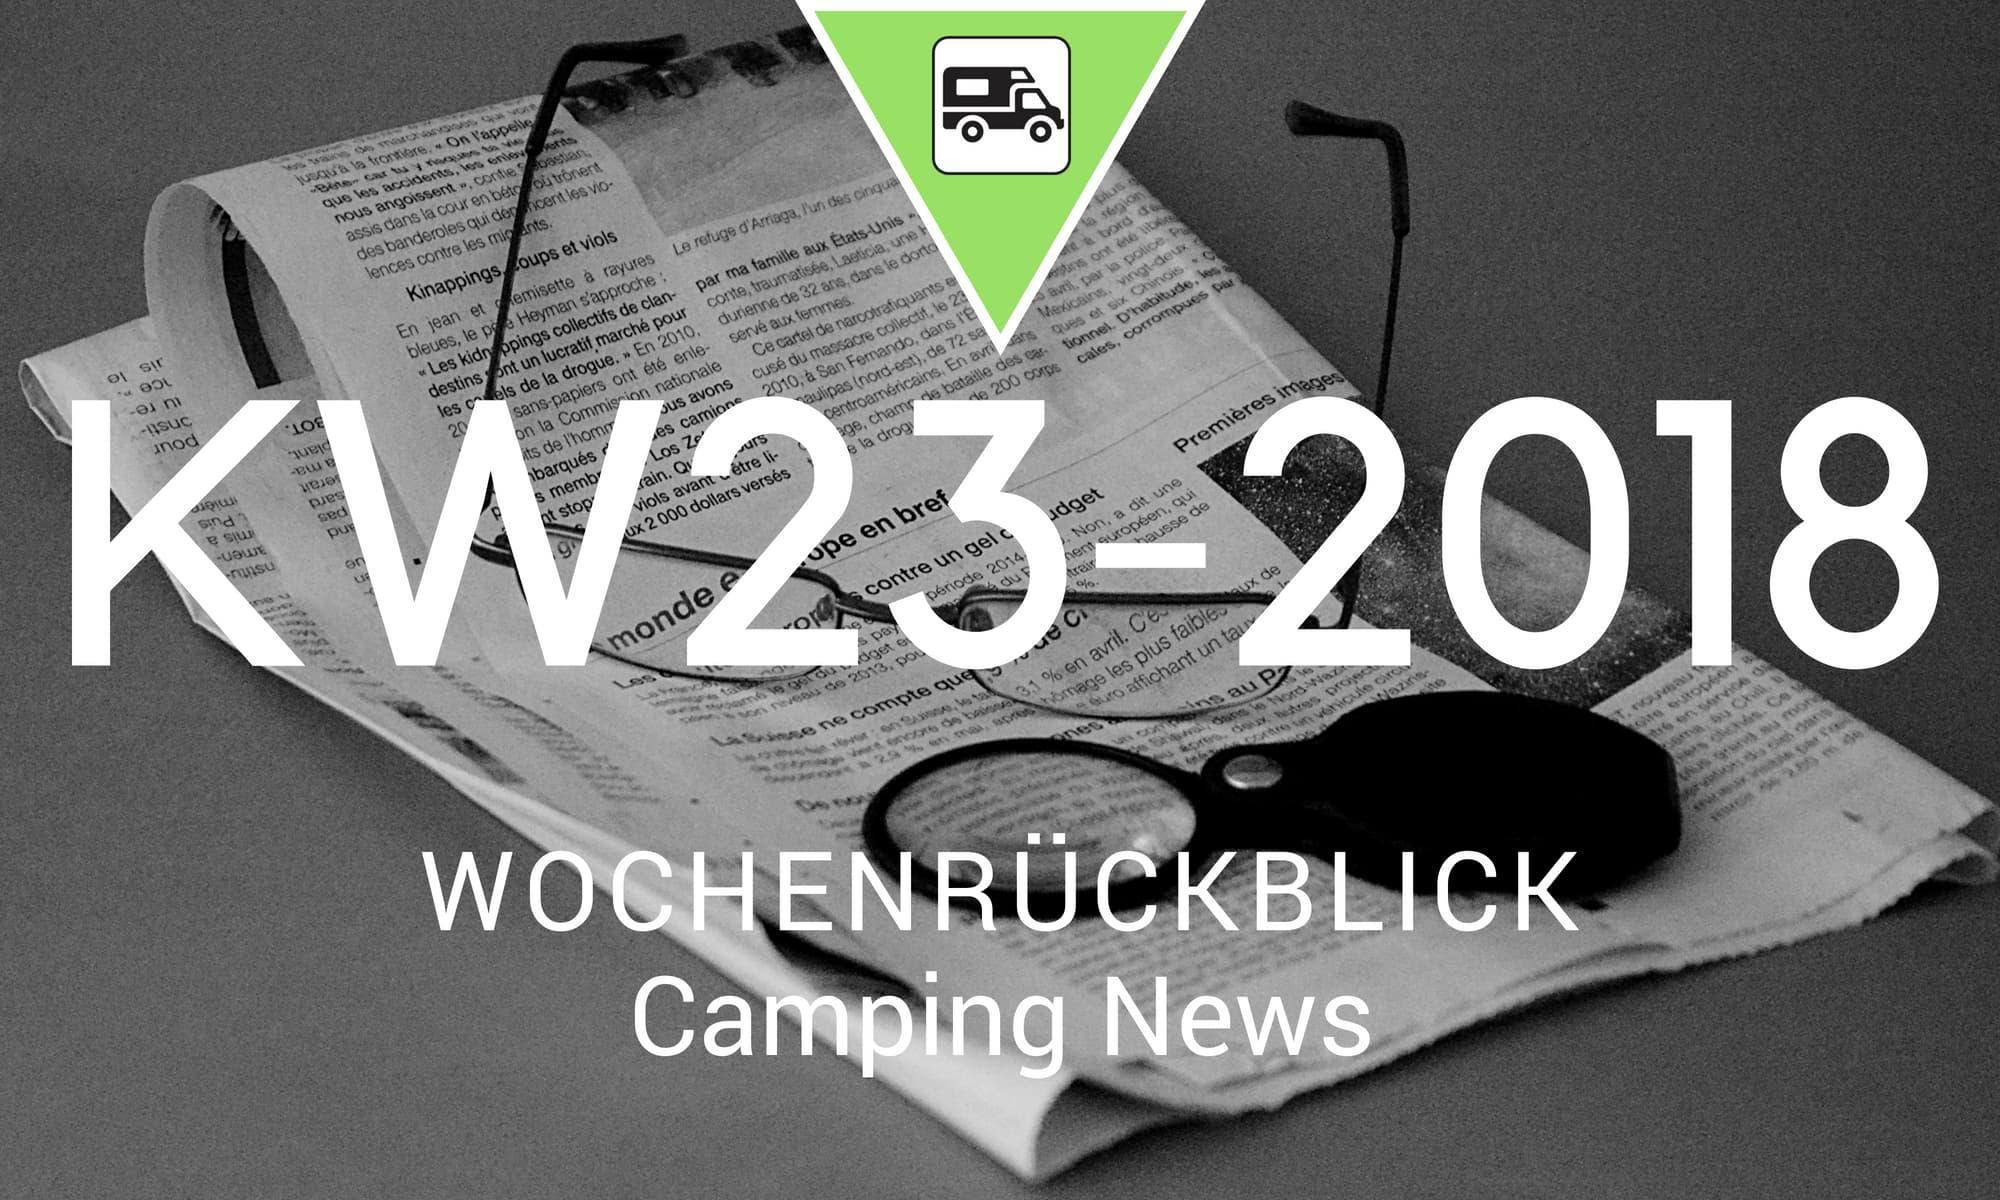 Wochenrückblick Camping News KW23-2018